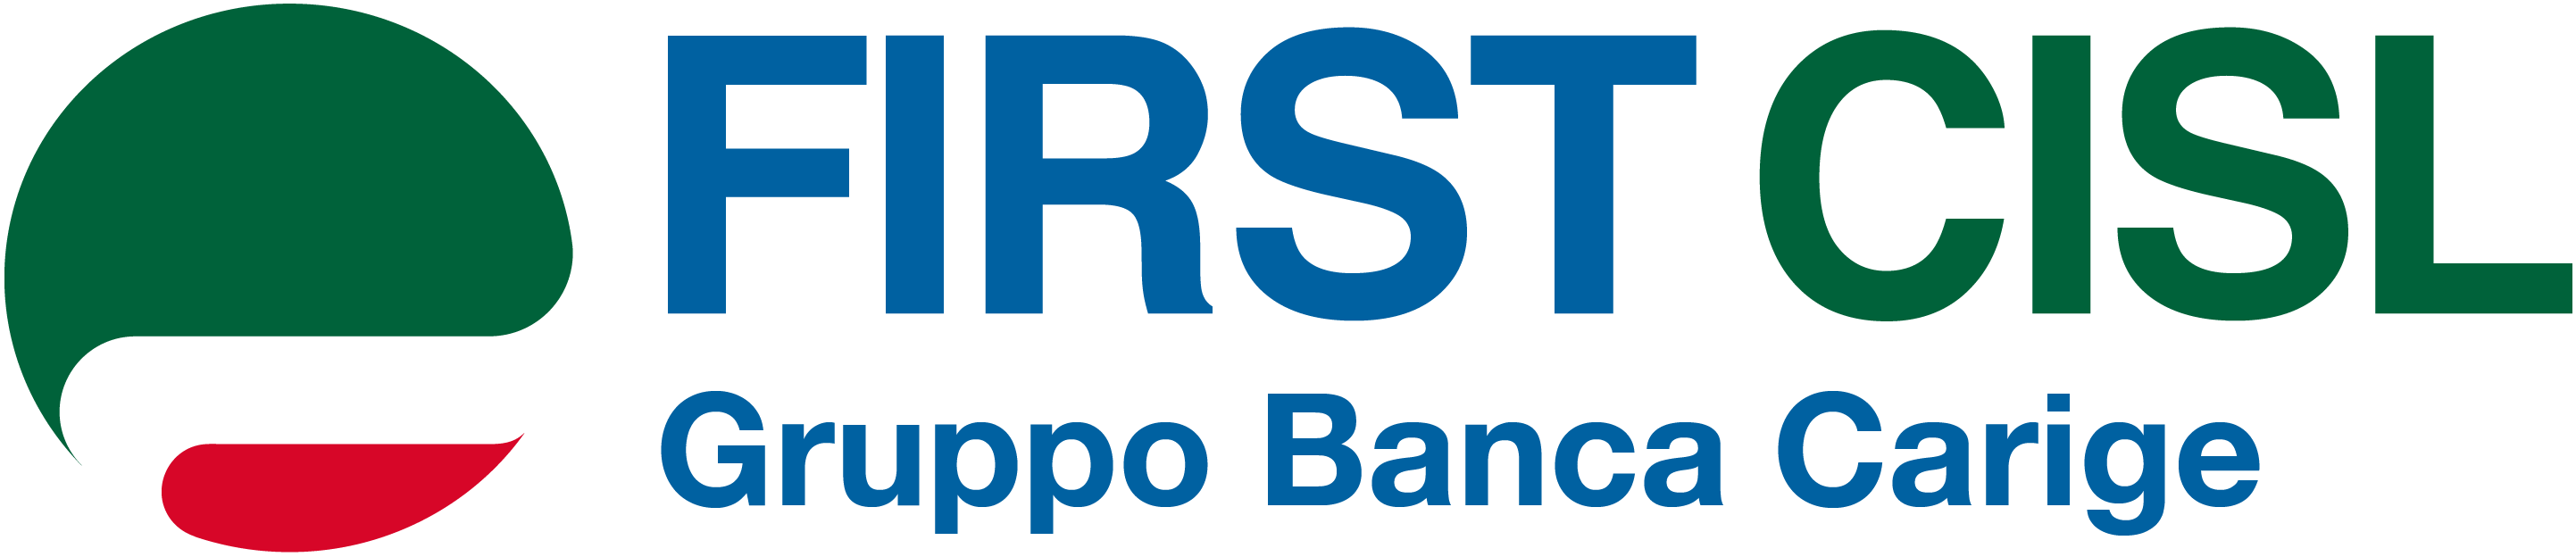 FIRST Banca Carige